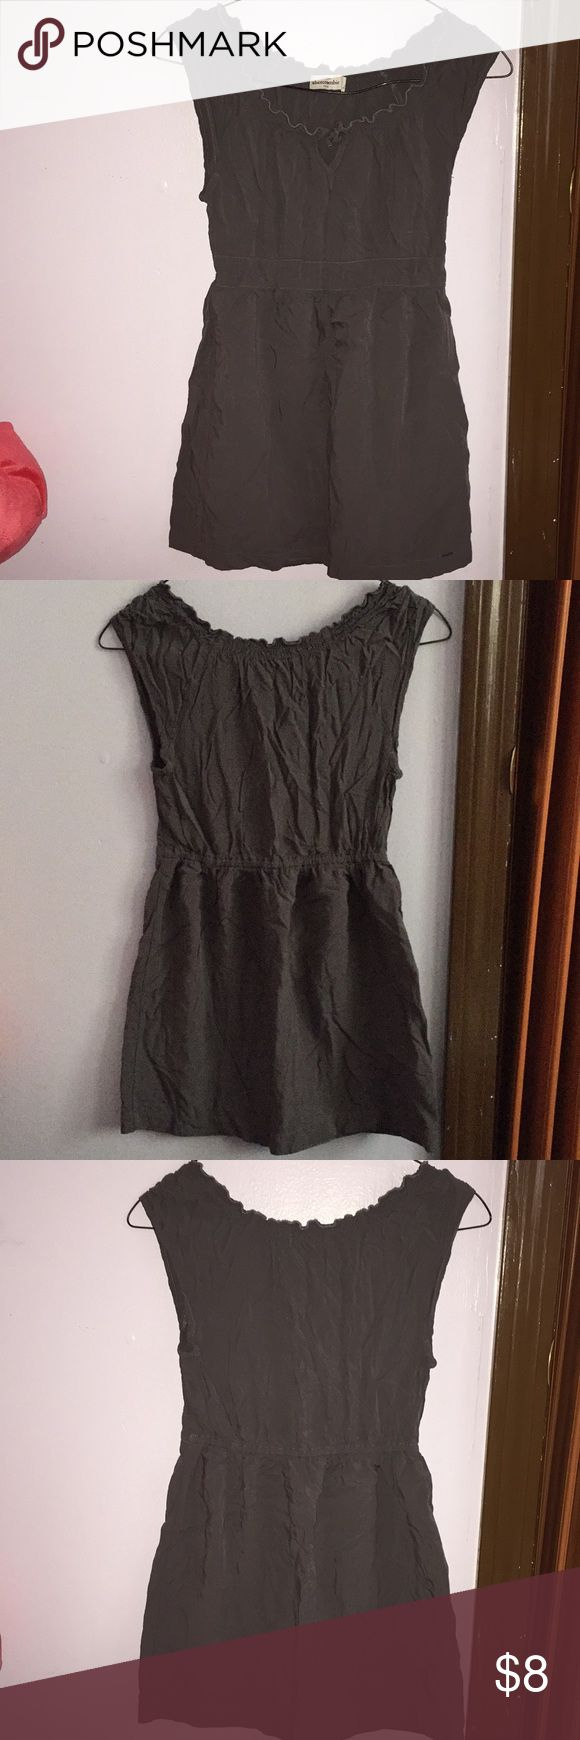 I just added this listing on Poshmark: Abercrombie Kids Charcoal Grey Dress. #shopmycloset #poshmark #fashion #shopping #style #forsale #abercrombie kids #Other